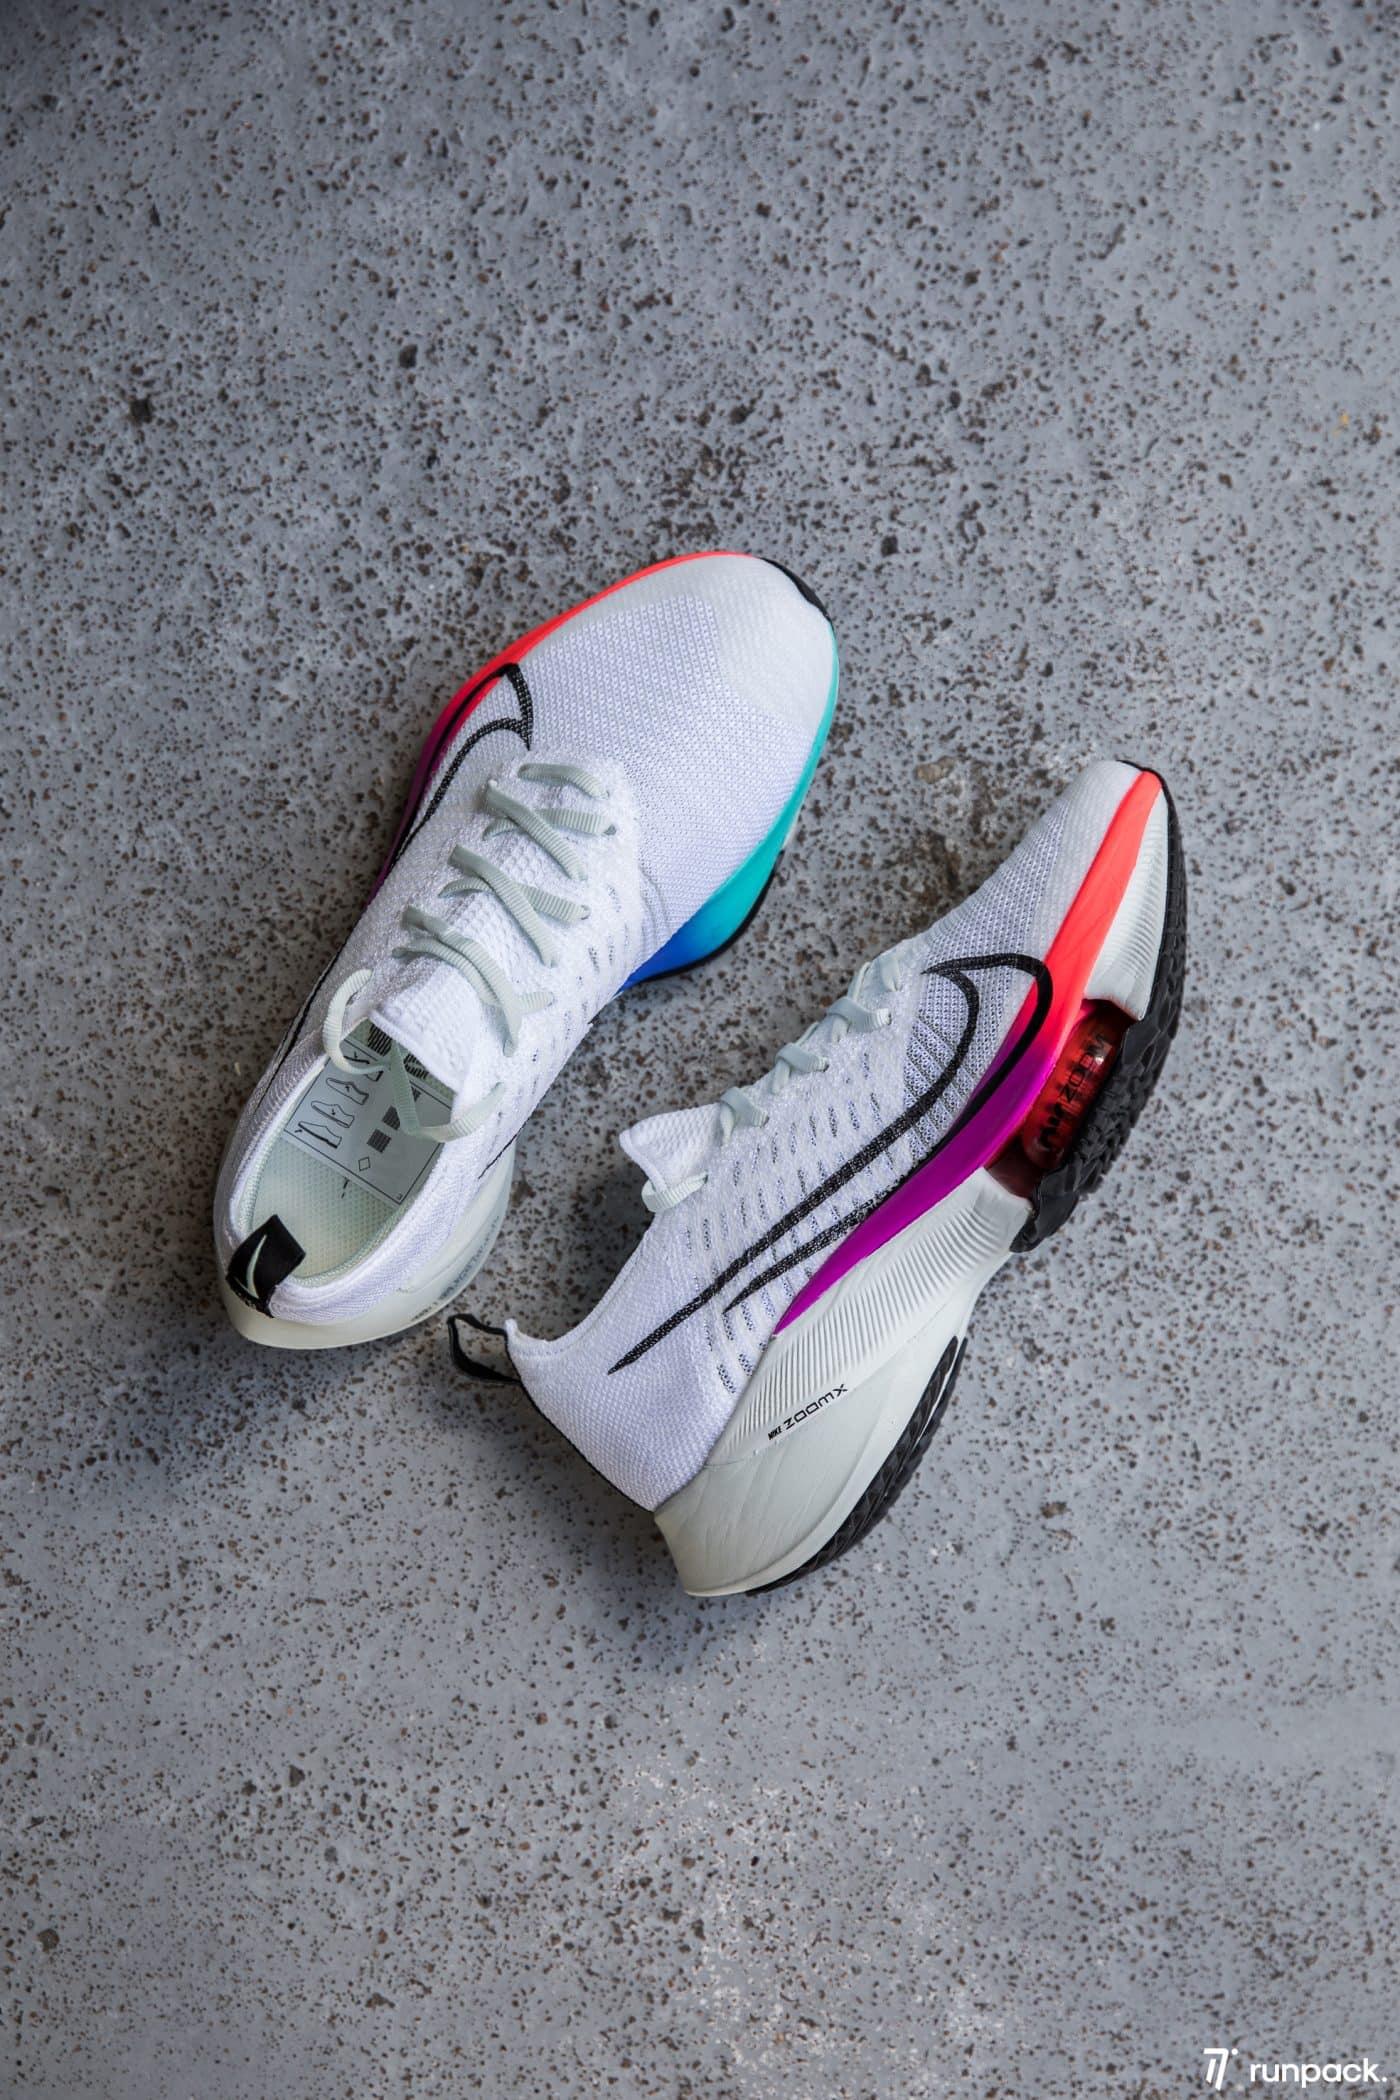 runpack_Nike_Air_Zoom_Tempo_next_1